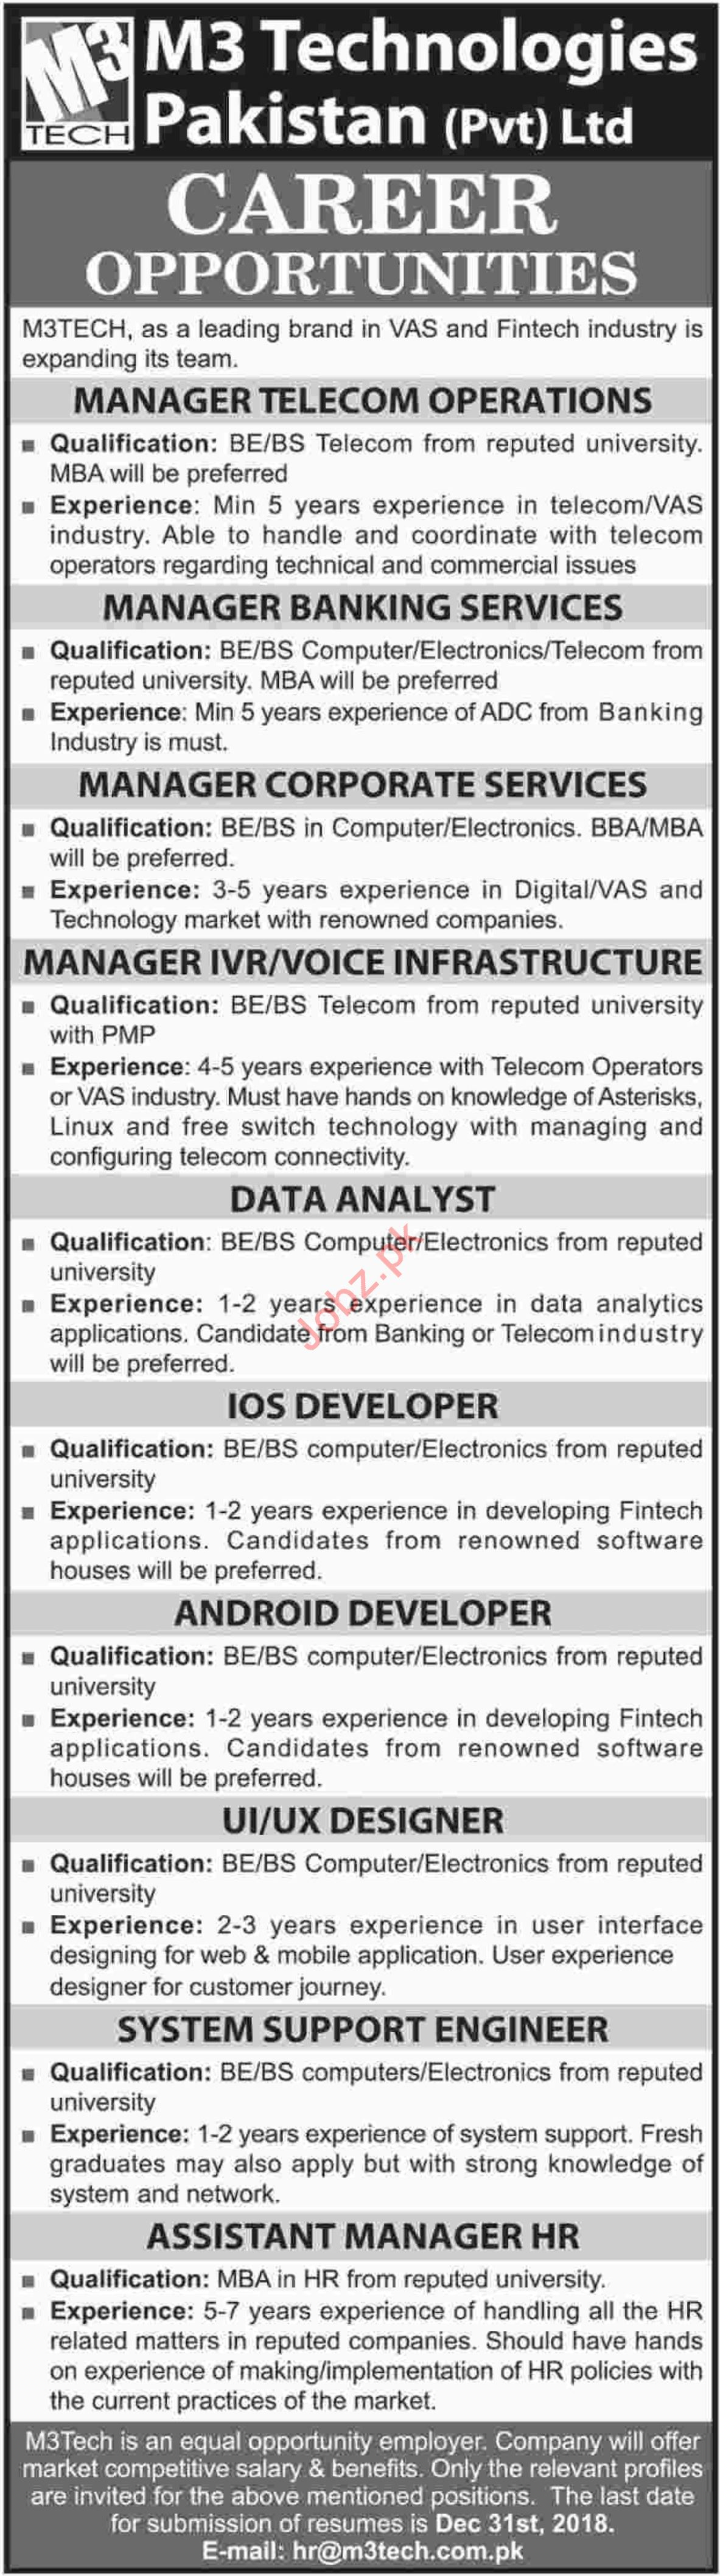 M3 Technologies Pakistan Ltd Manager Telecom Operations Jobs